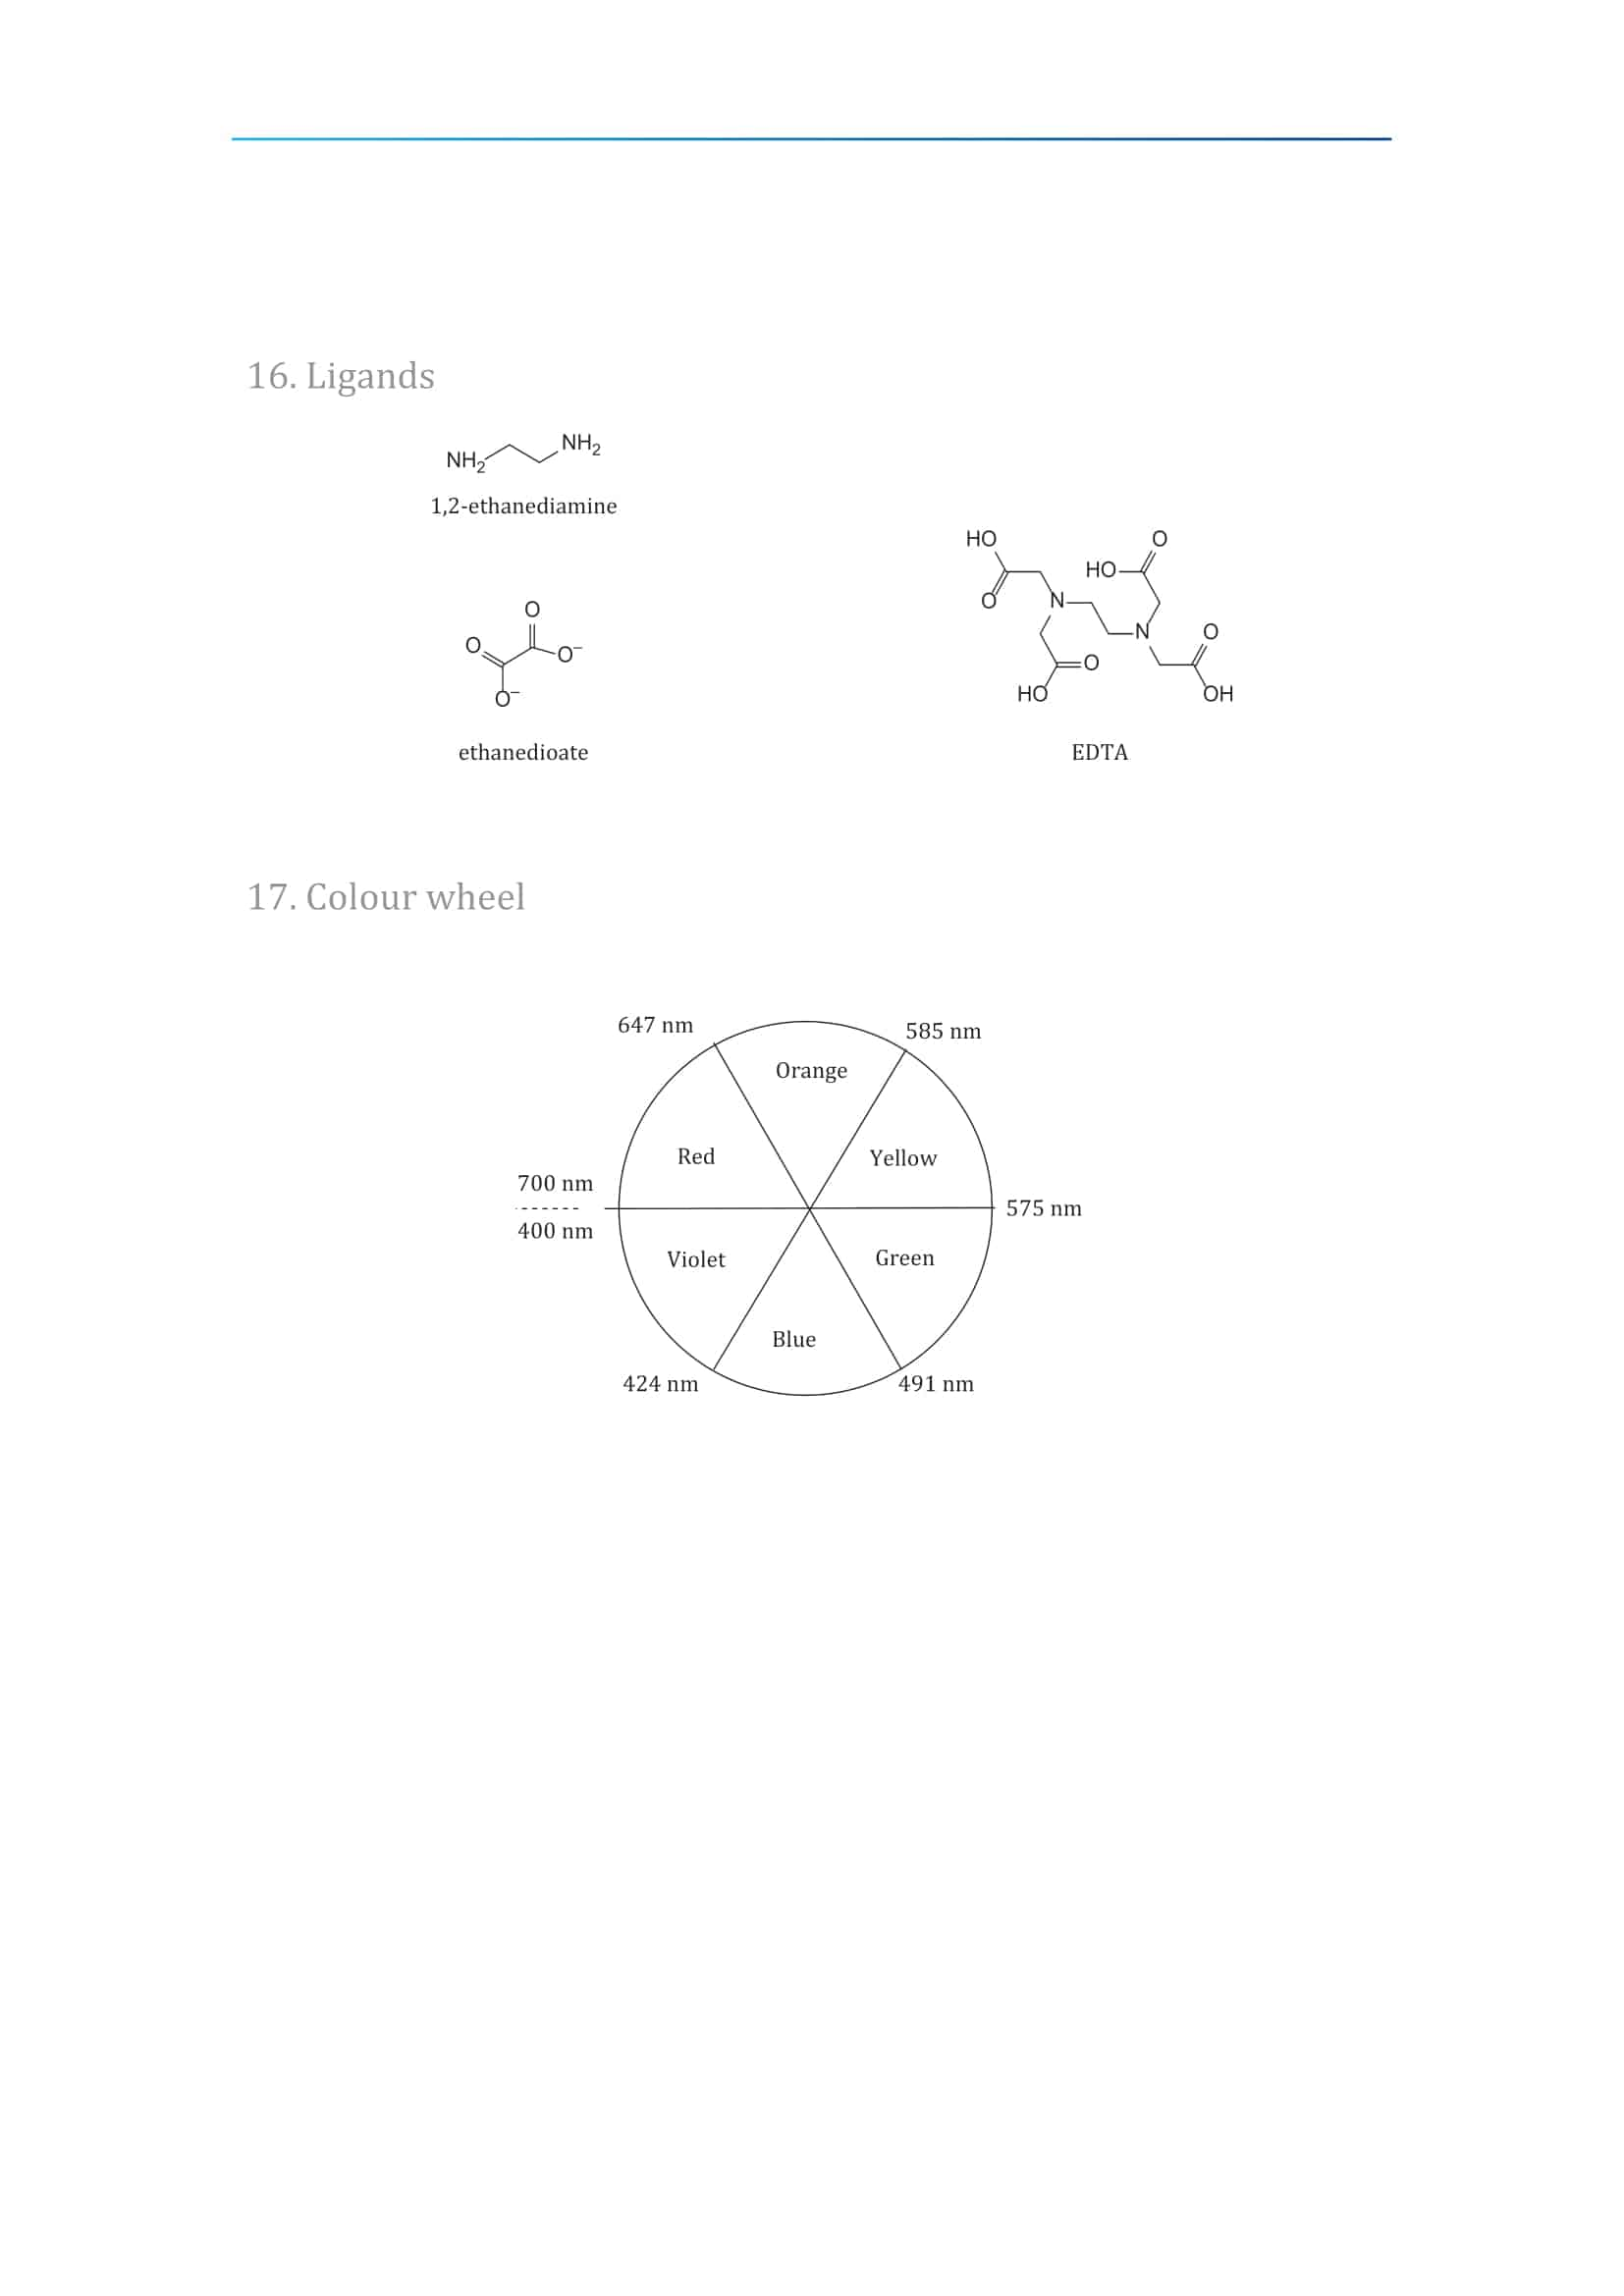 IB Chemistry Data Booklet 2020 19